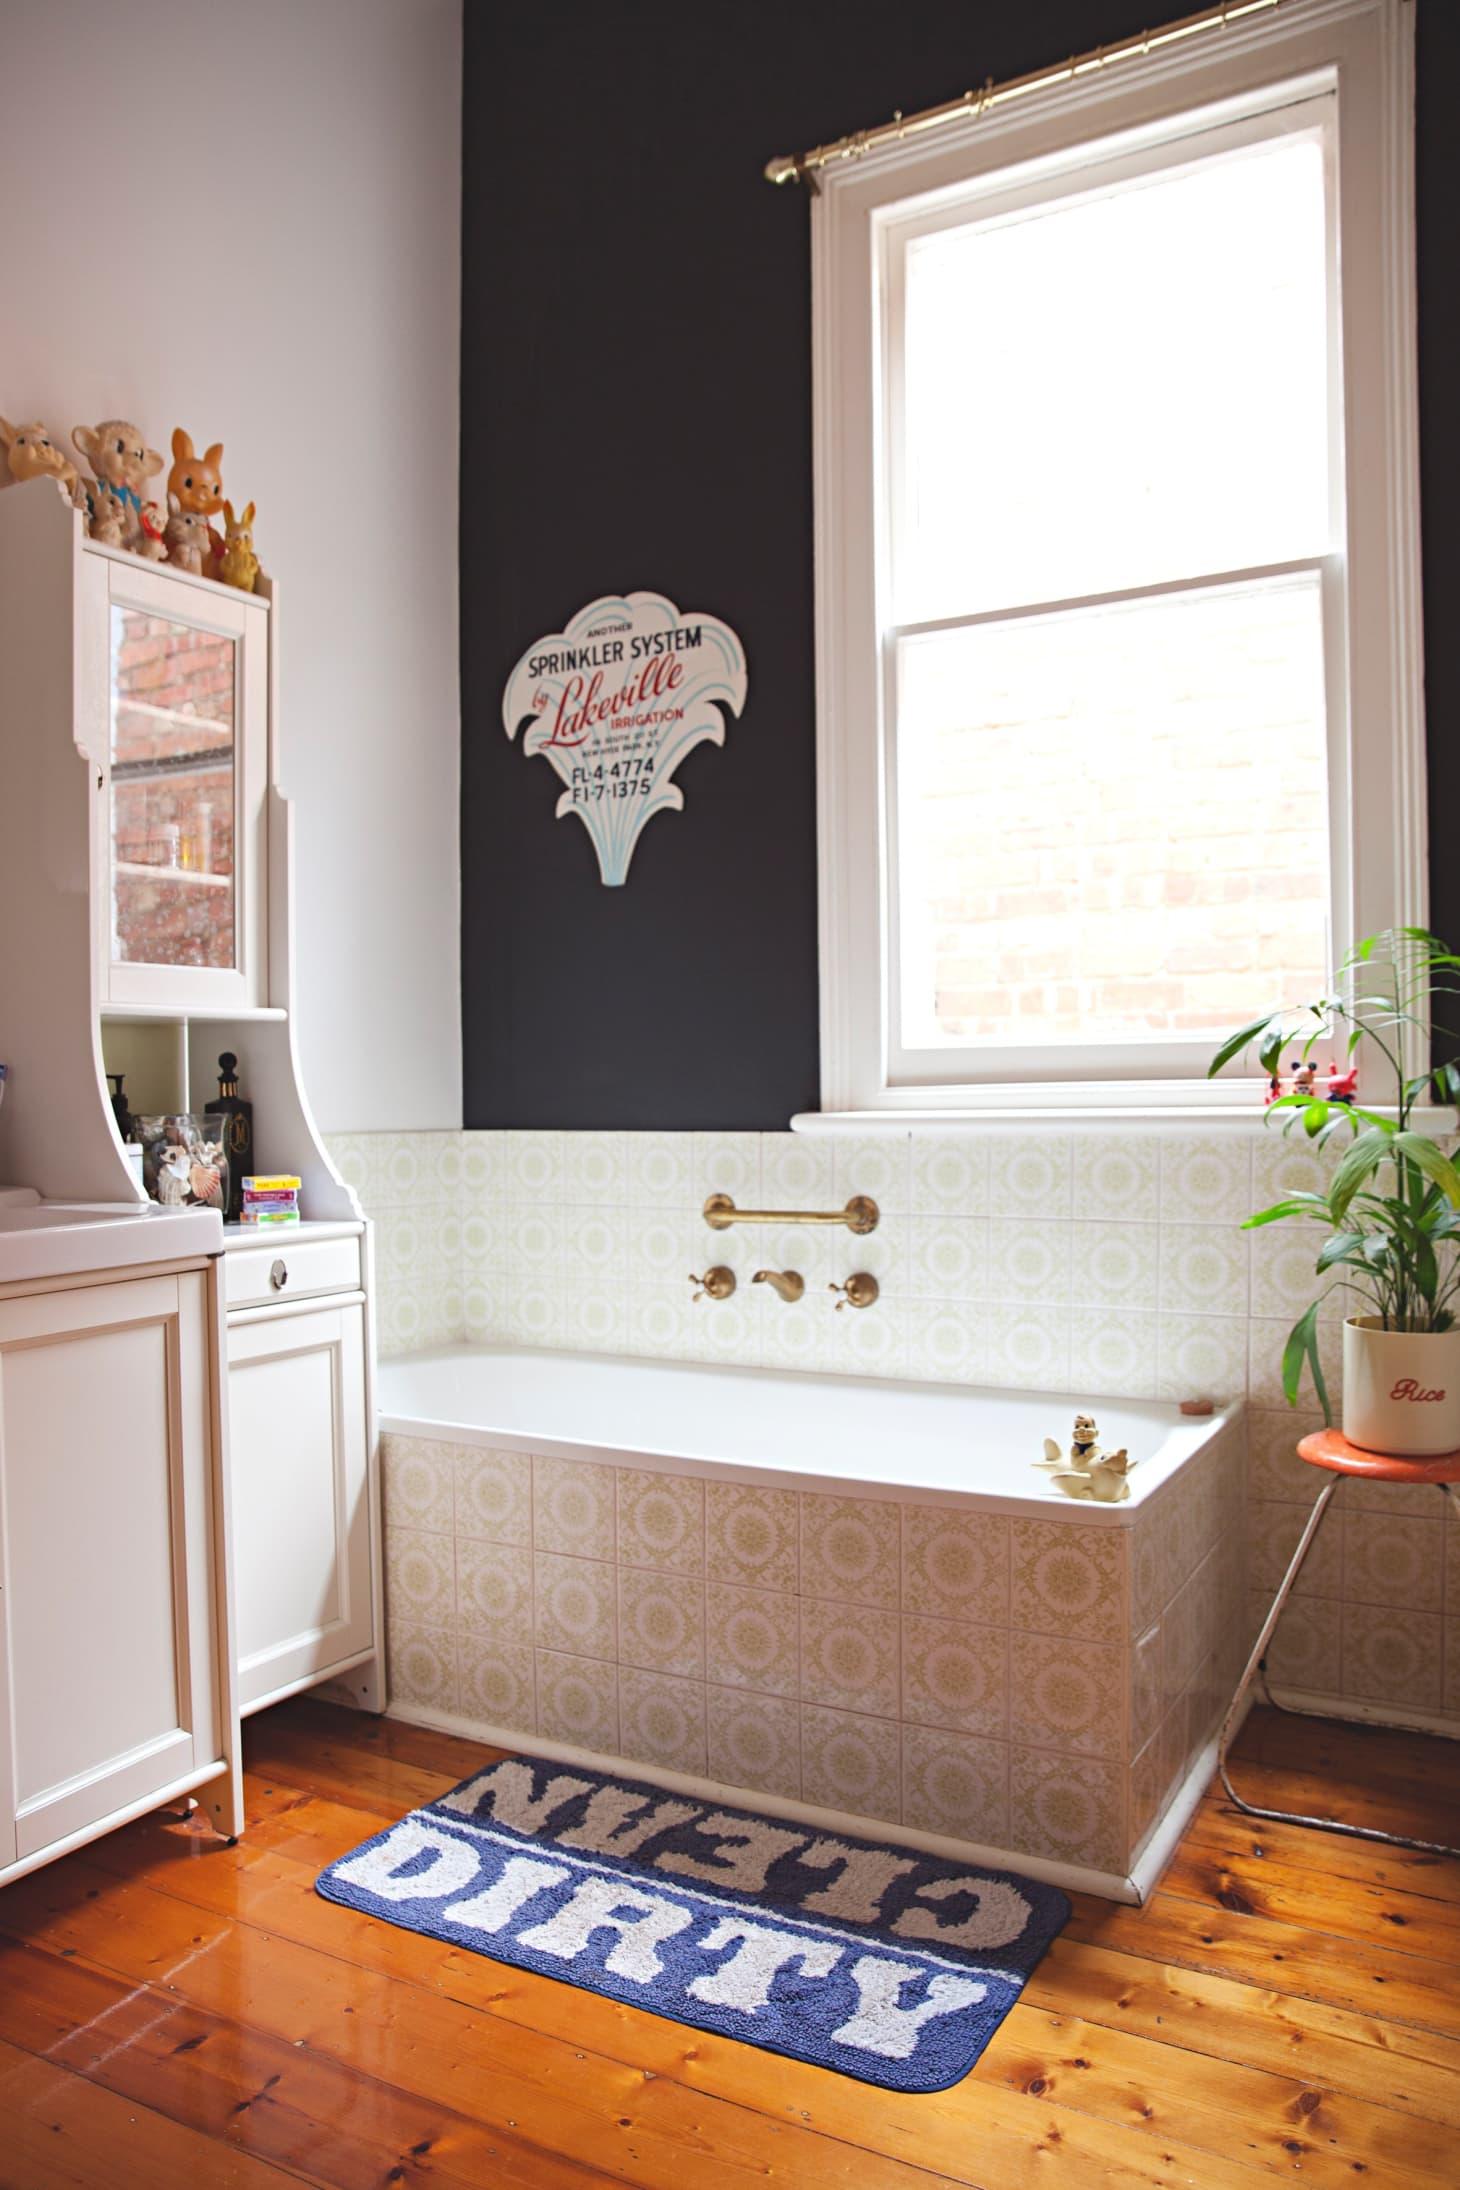 The 30 Best Bathroom Colors - Bathroom Paint Color Ideas ...